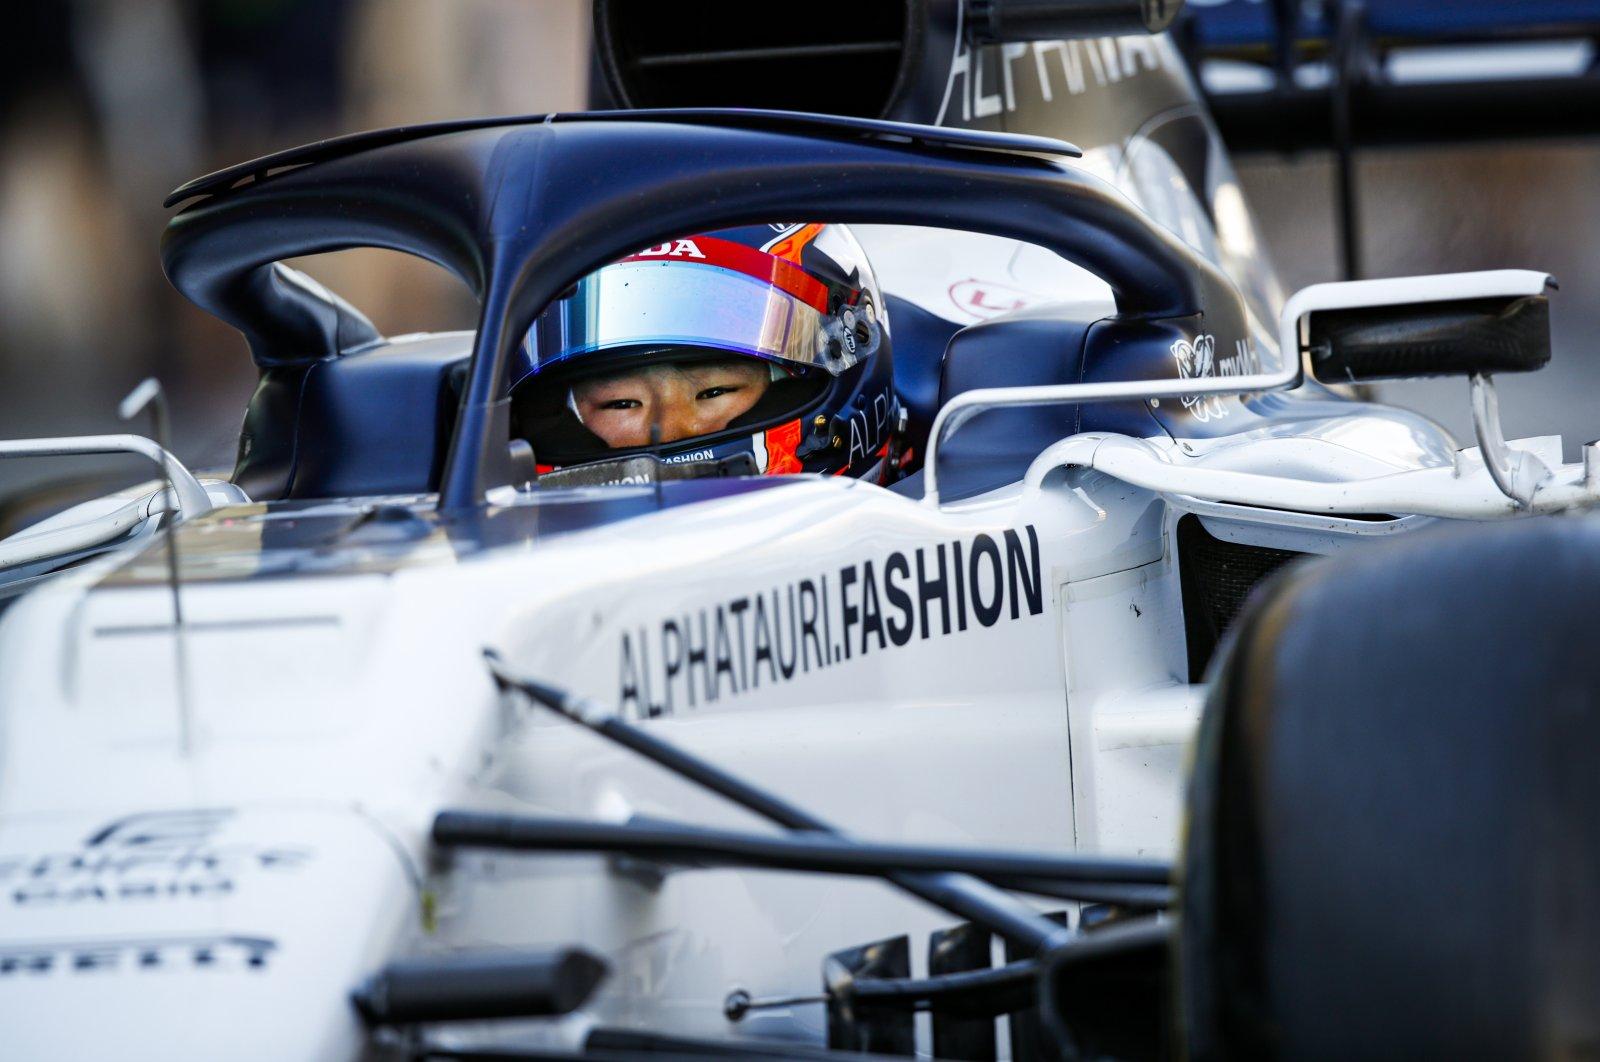 Yuki Tsunoda participates in a test drive for the AlphaTauri F1 team at the Yas Marina Circuit in Abu Dhabi, UAE, Dec. 15, 2020. (Reuters Photo)